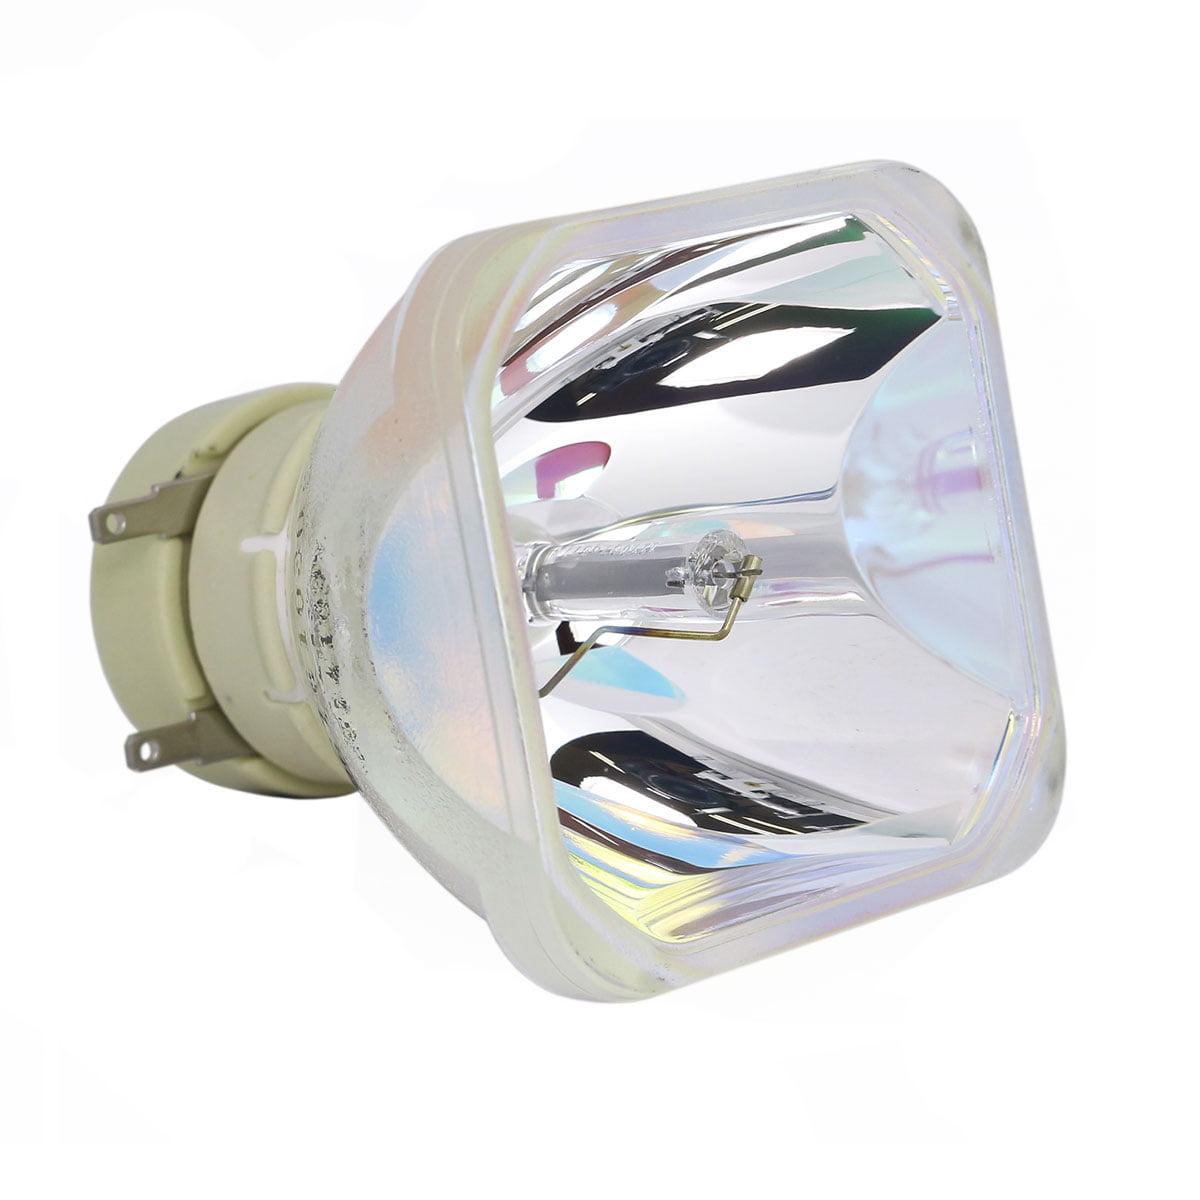 Lutema Platinum for Sony LMP-E220 Projector Lamp (Original Philips Bulb) - image 4 of 5